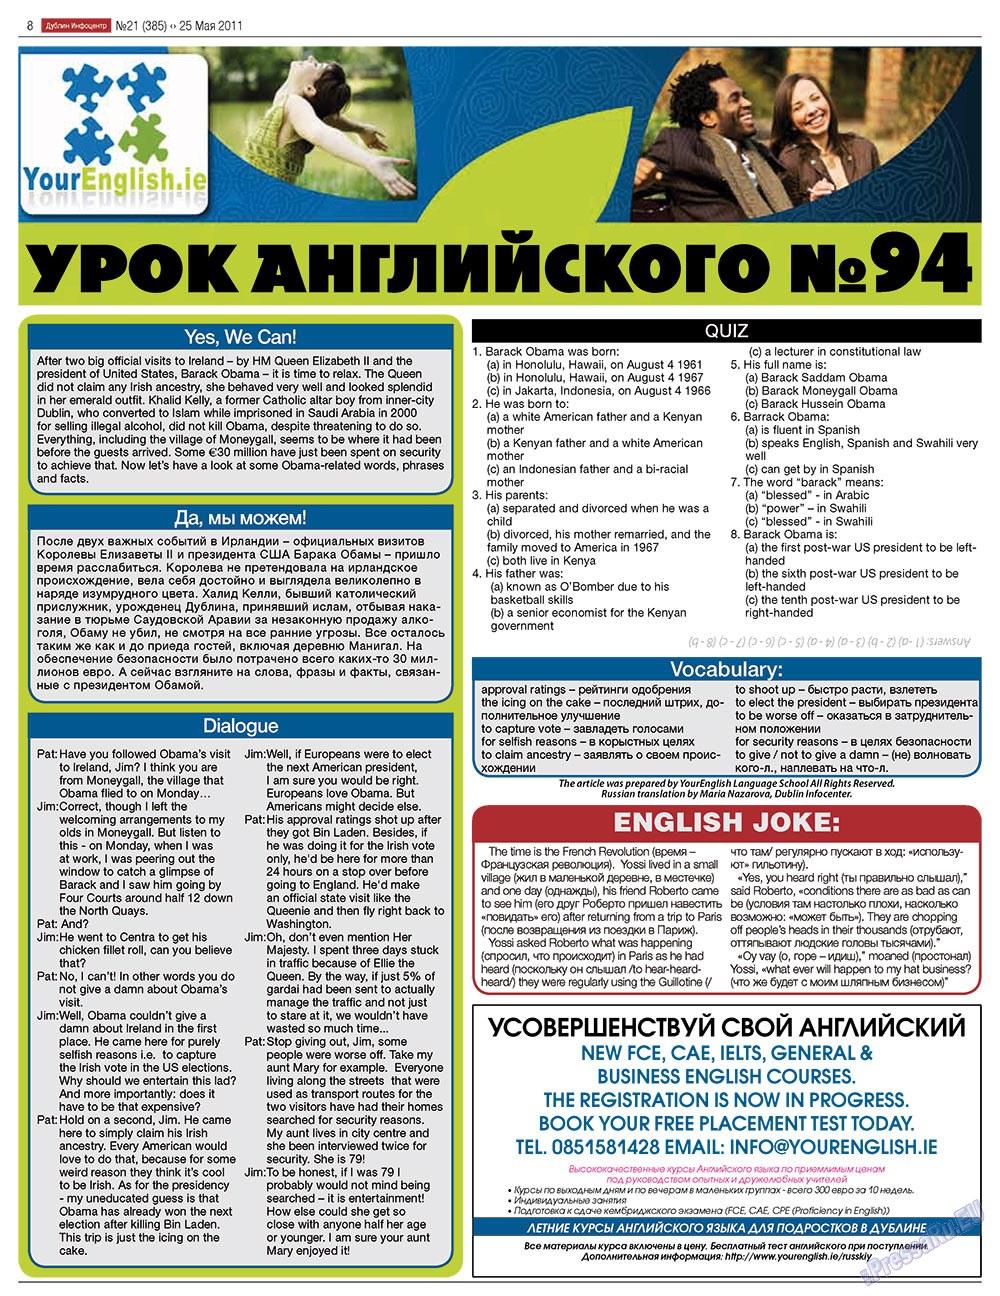 Дублин инфоцентр (газета). 2011 год, номер 21, стр. 8